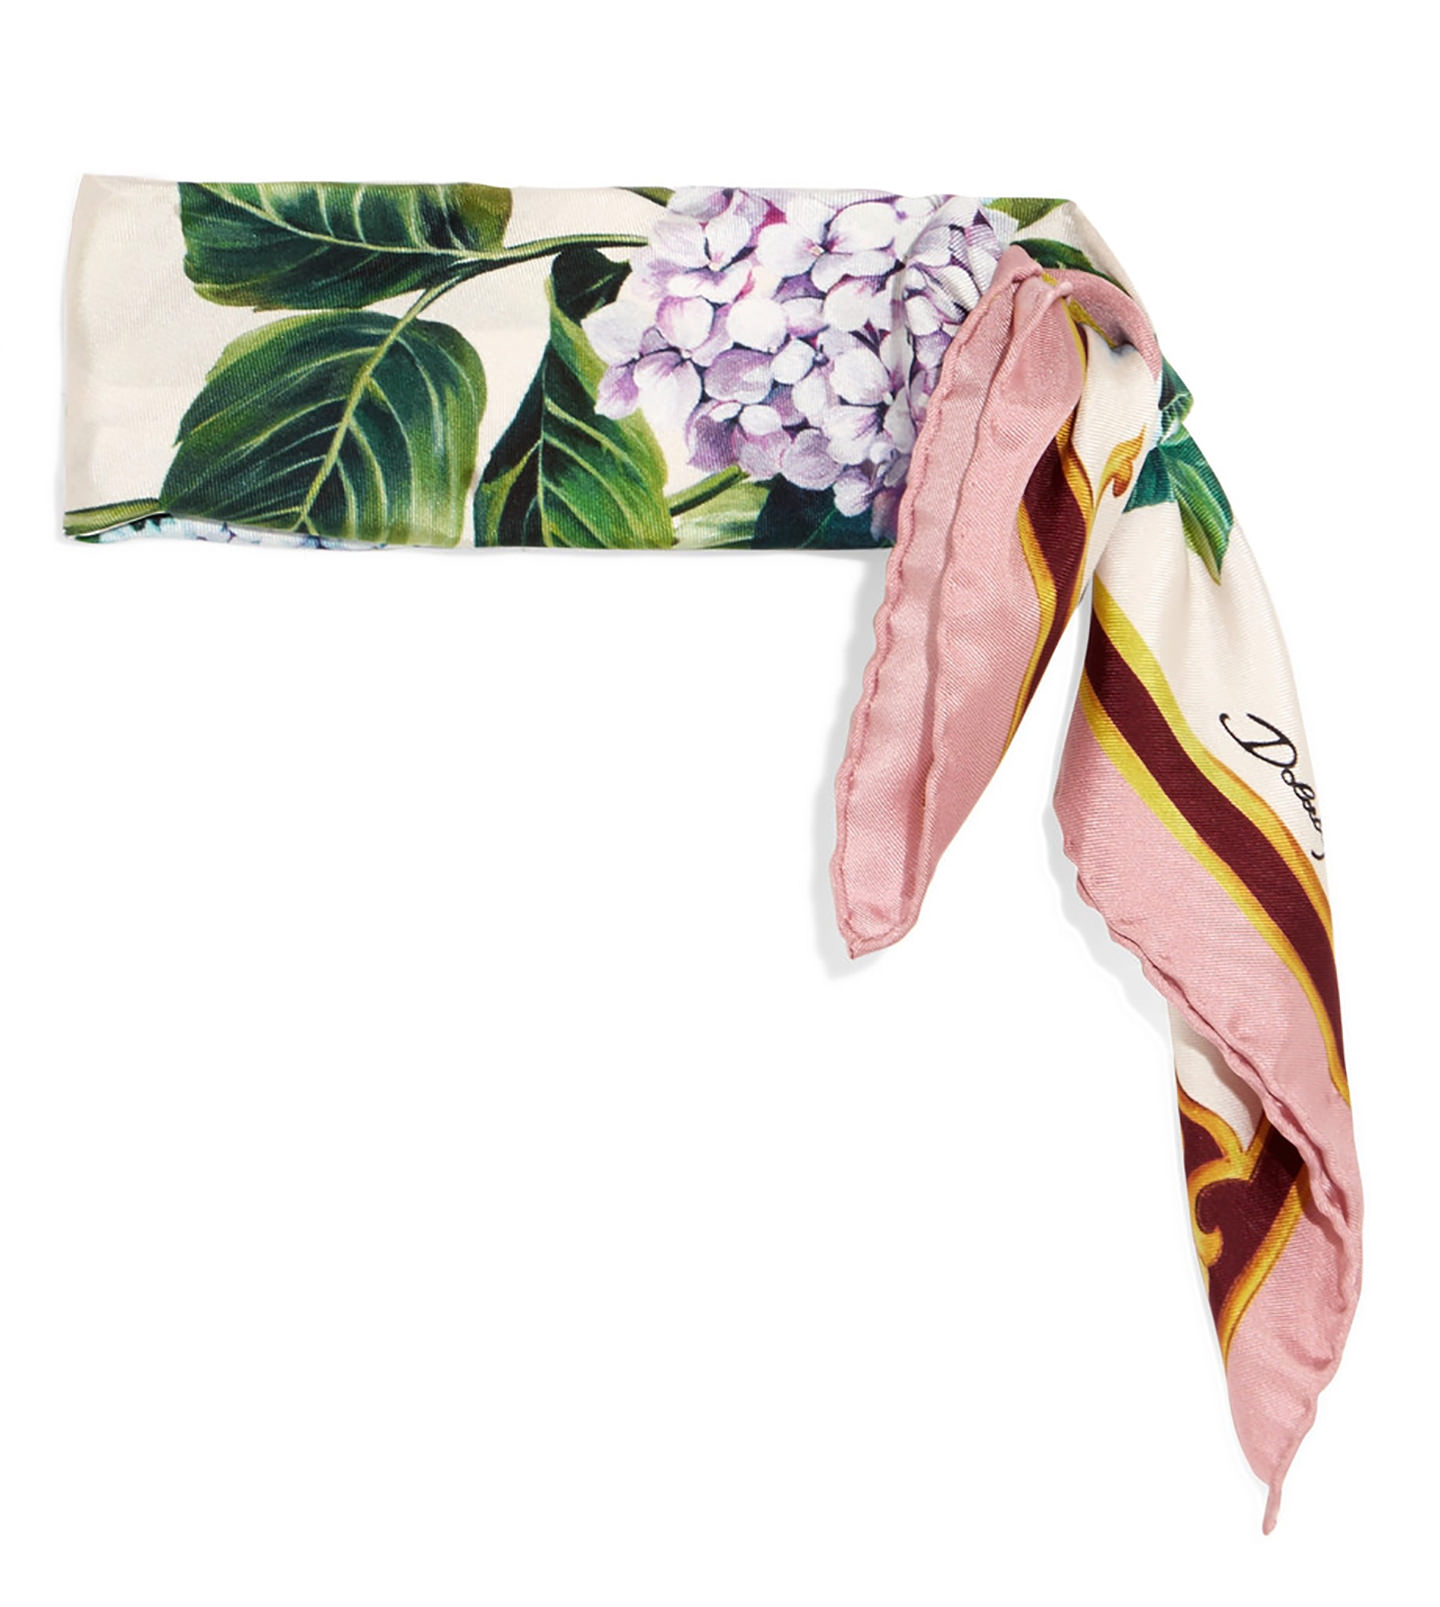 Blog-Mode-And-The-City-224-foulard-hortensias-dolce-gabbana